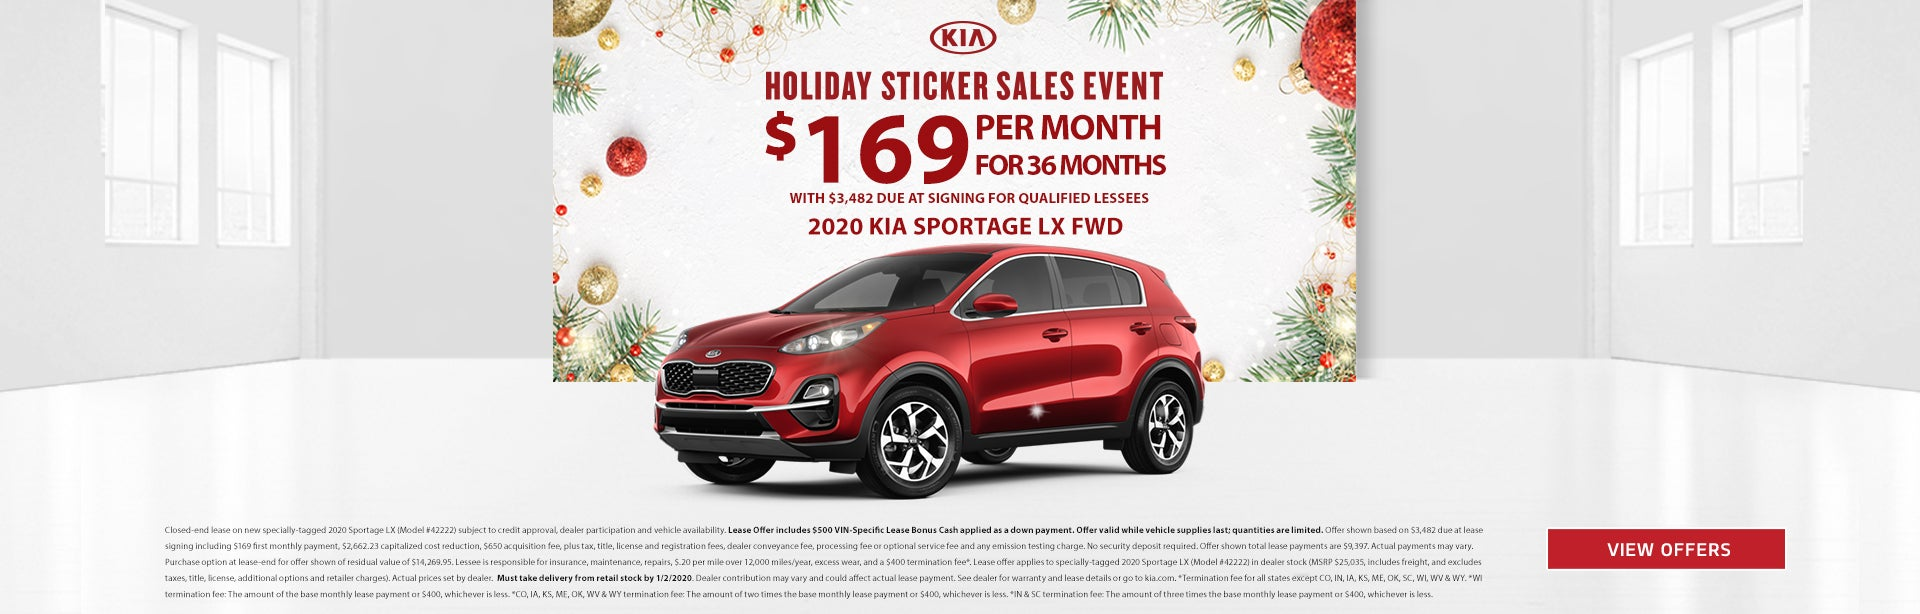 Used Cars For Sale Las Vegas >> Kia Dealer In Las Vegas Nv Used Cars Las Vegas Findlay Kia